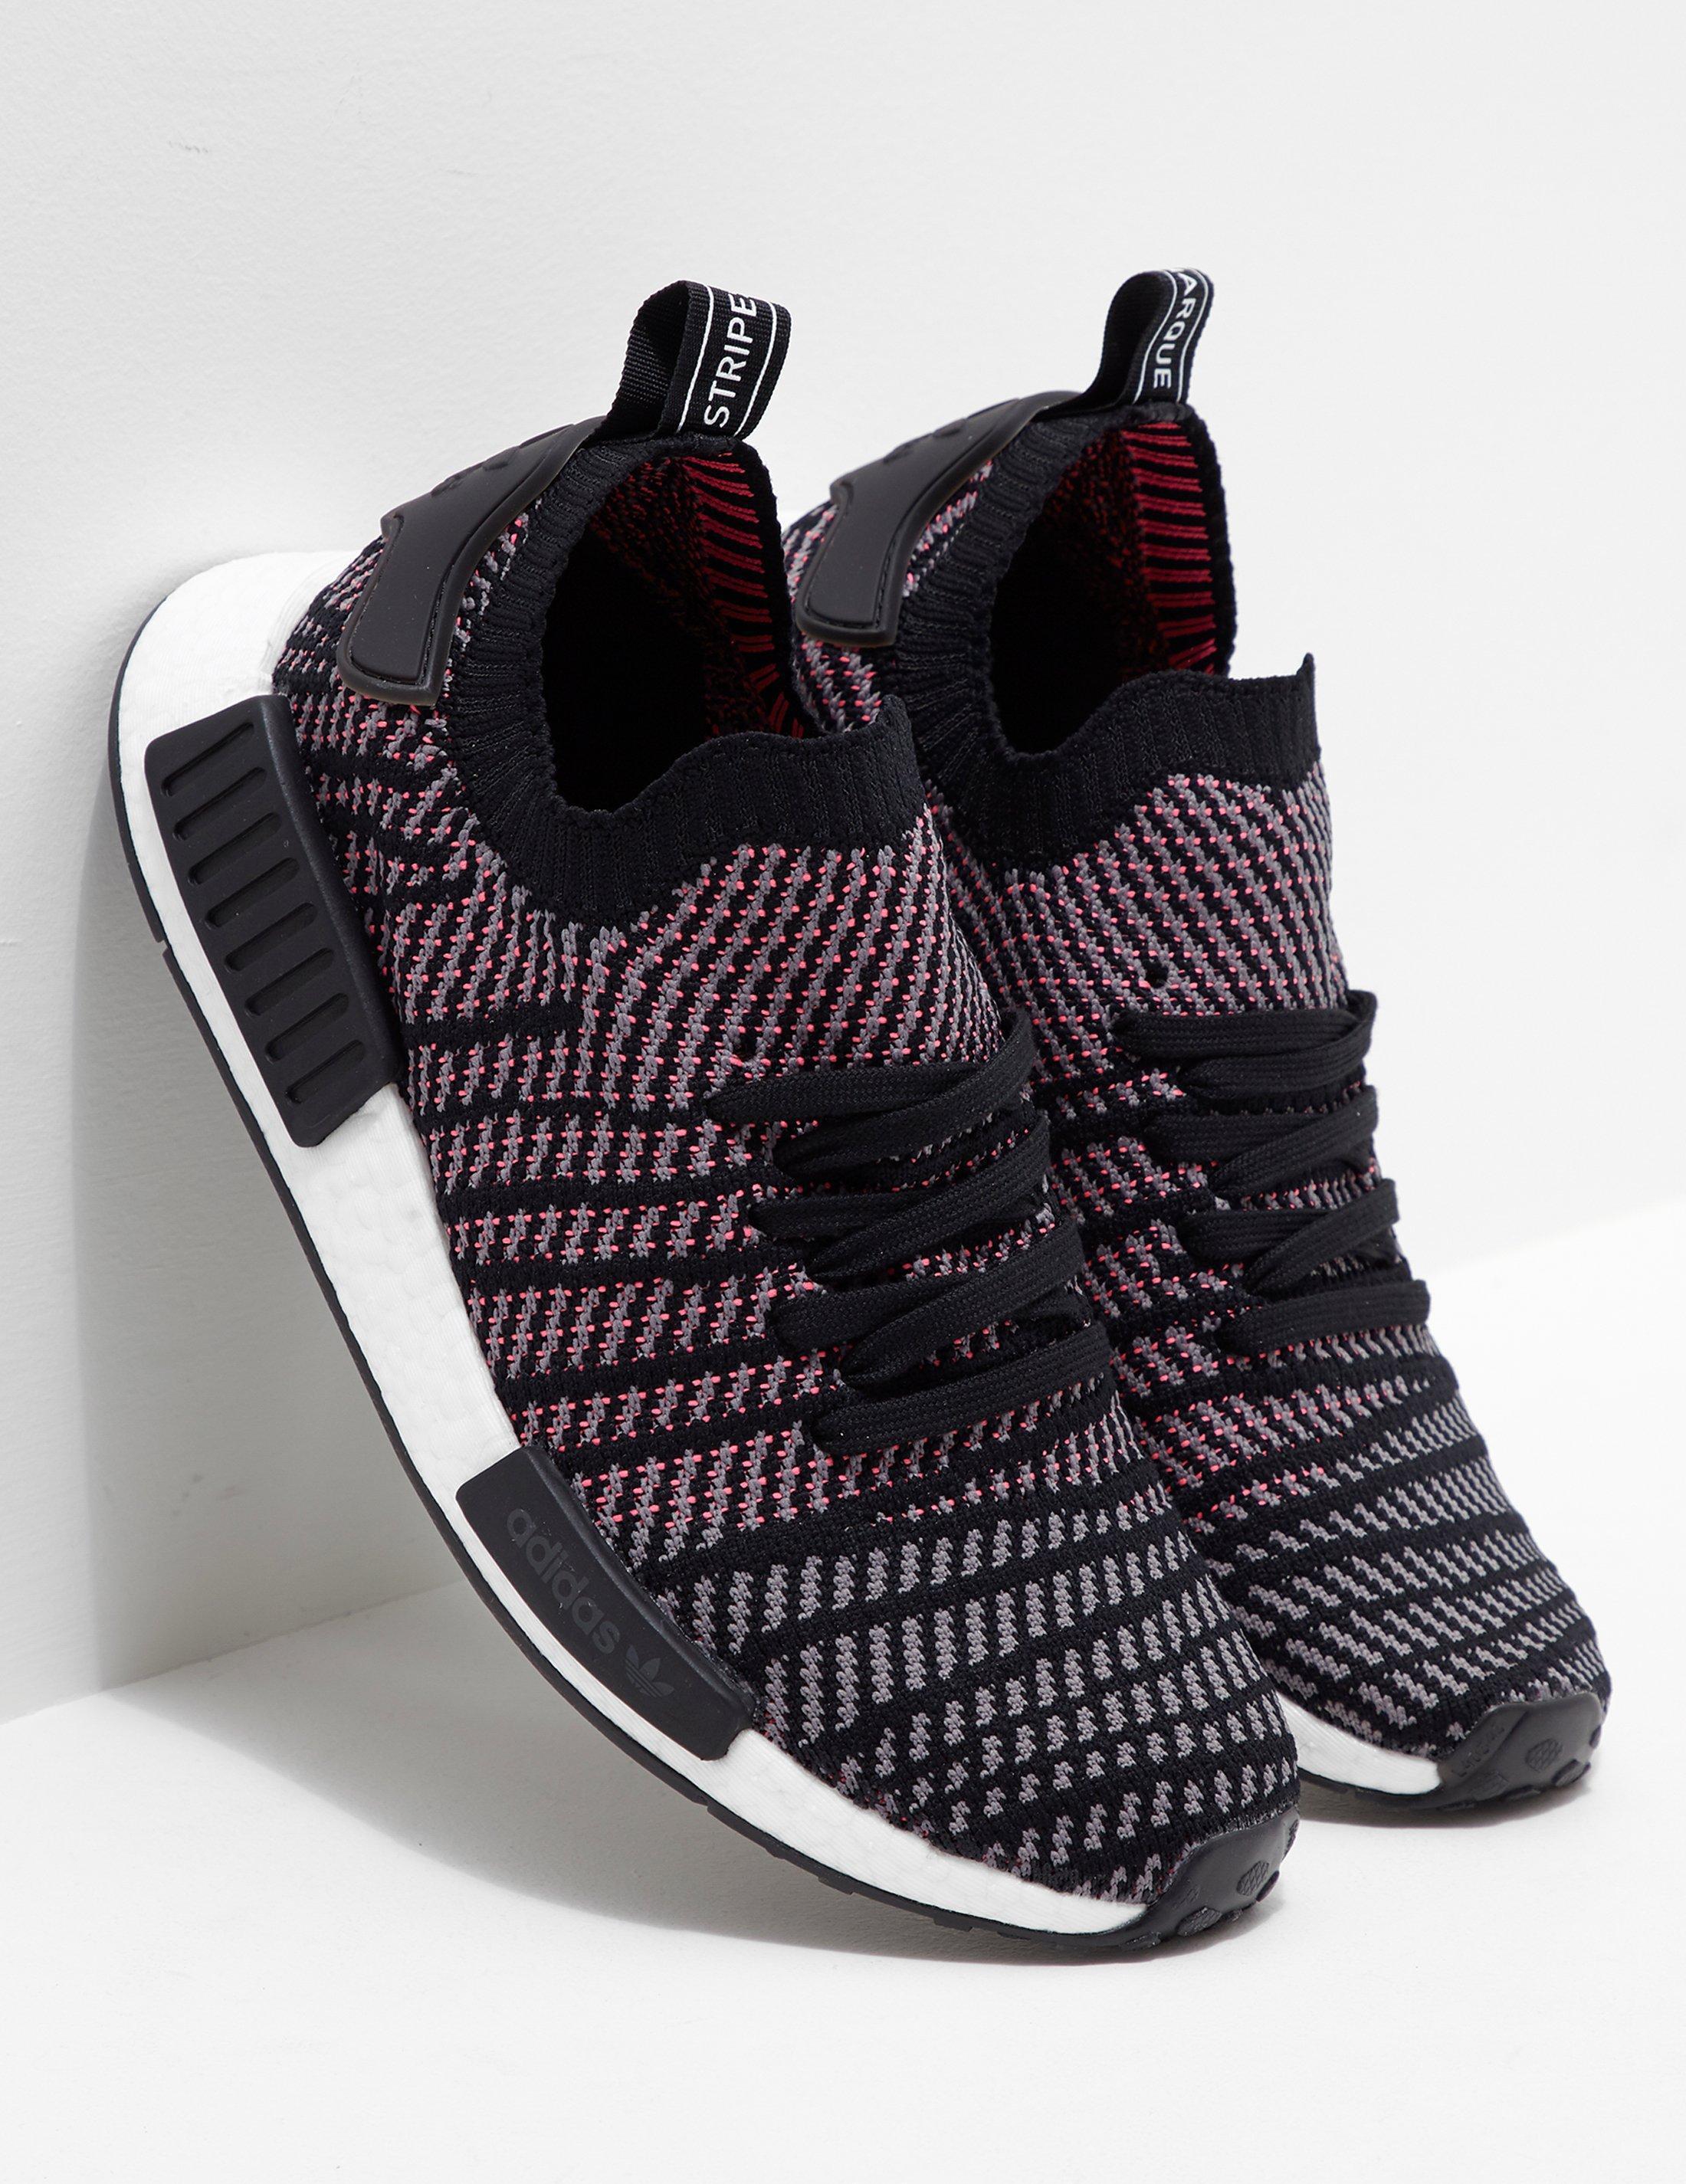 Adidas originali Uomo nmd r1 stlt primeknit nero / rosa in nero